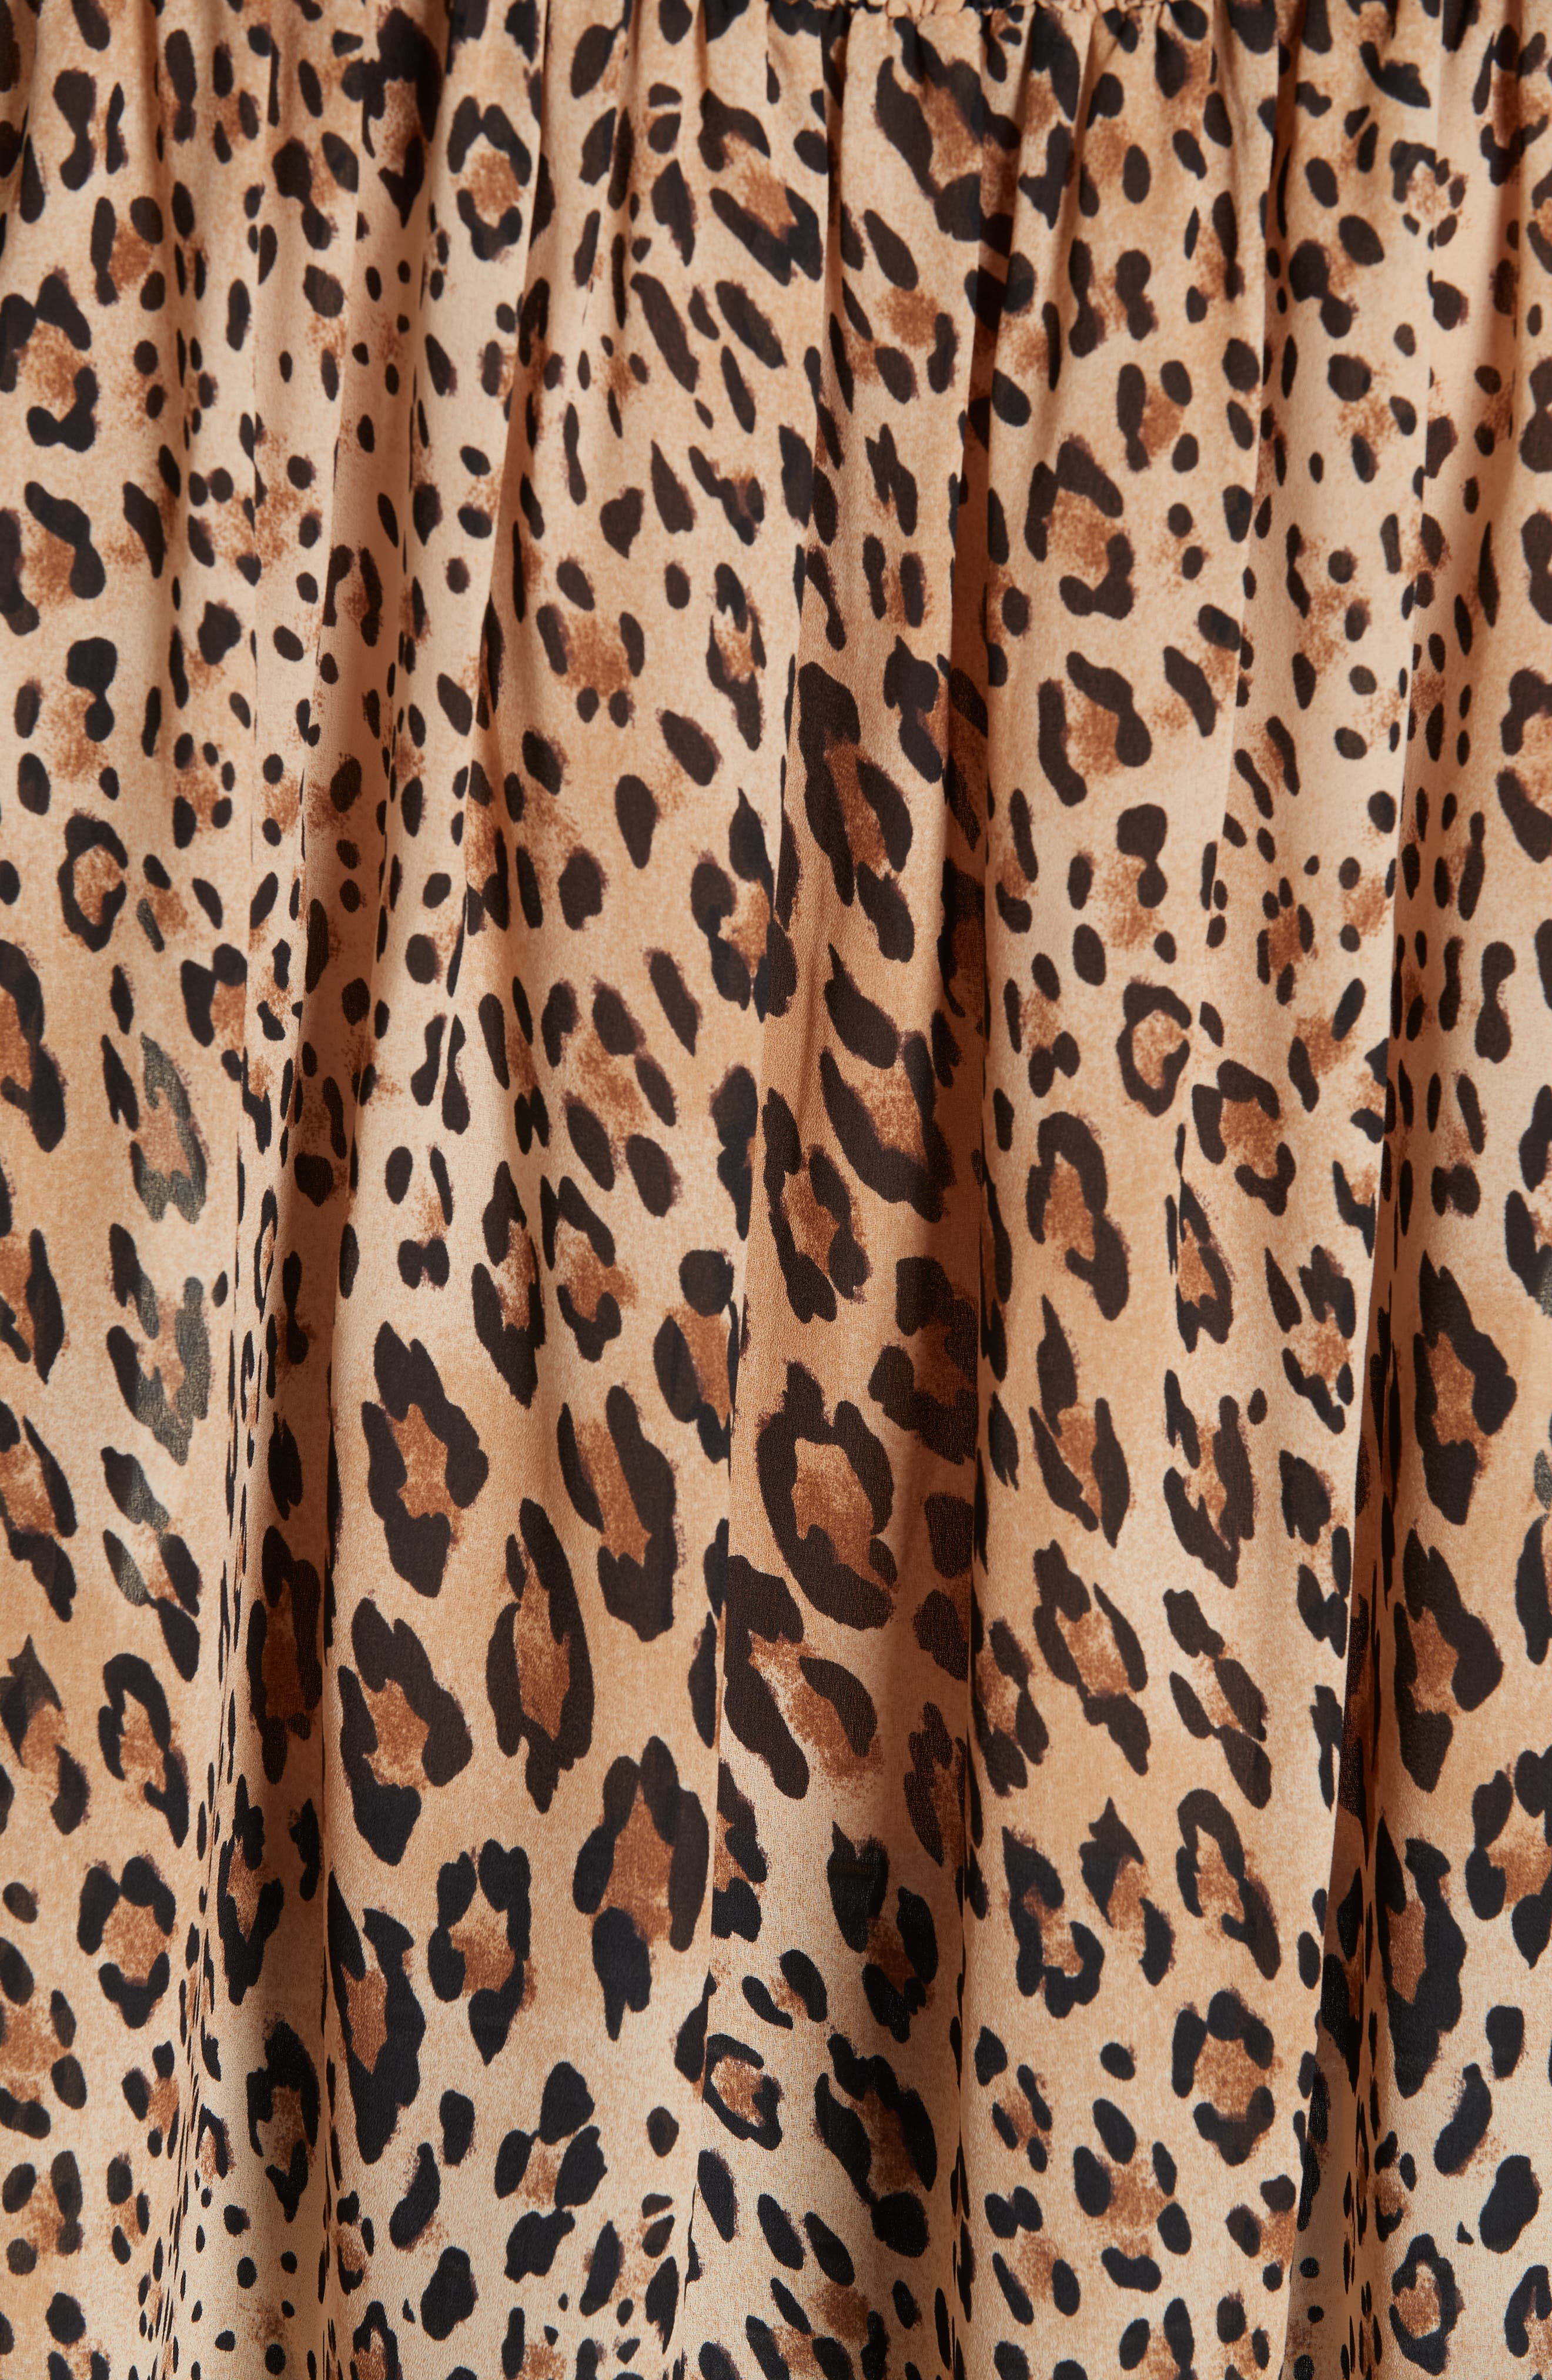 Leopard Print Smocked Silk Blouse,                             Alternate thumbnail 5, color,                             201